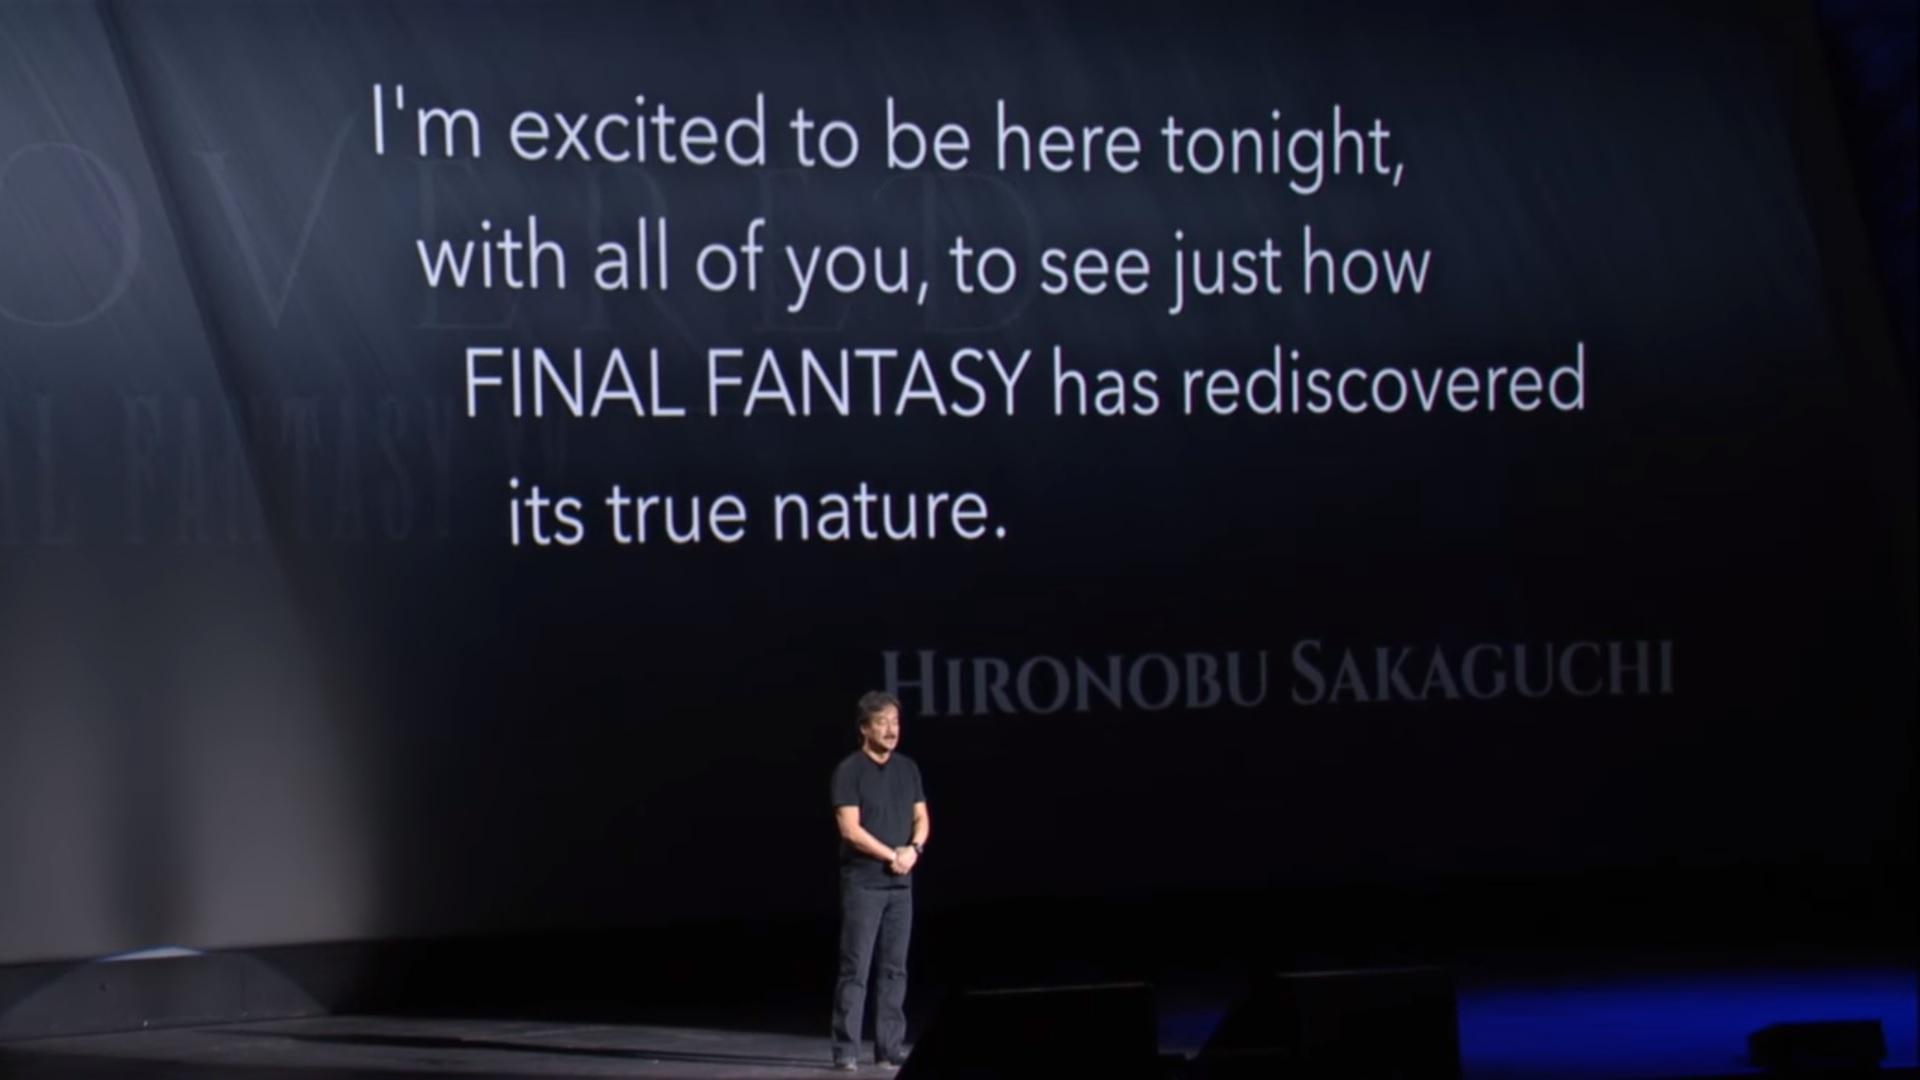 Hironobu Sakaguchi Final Fantasy XV